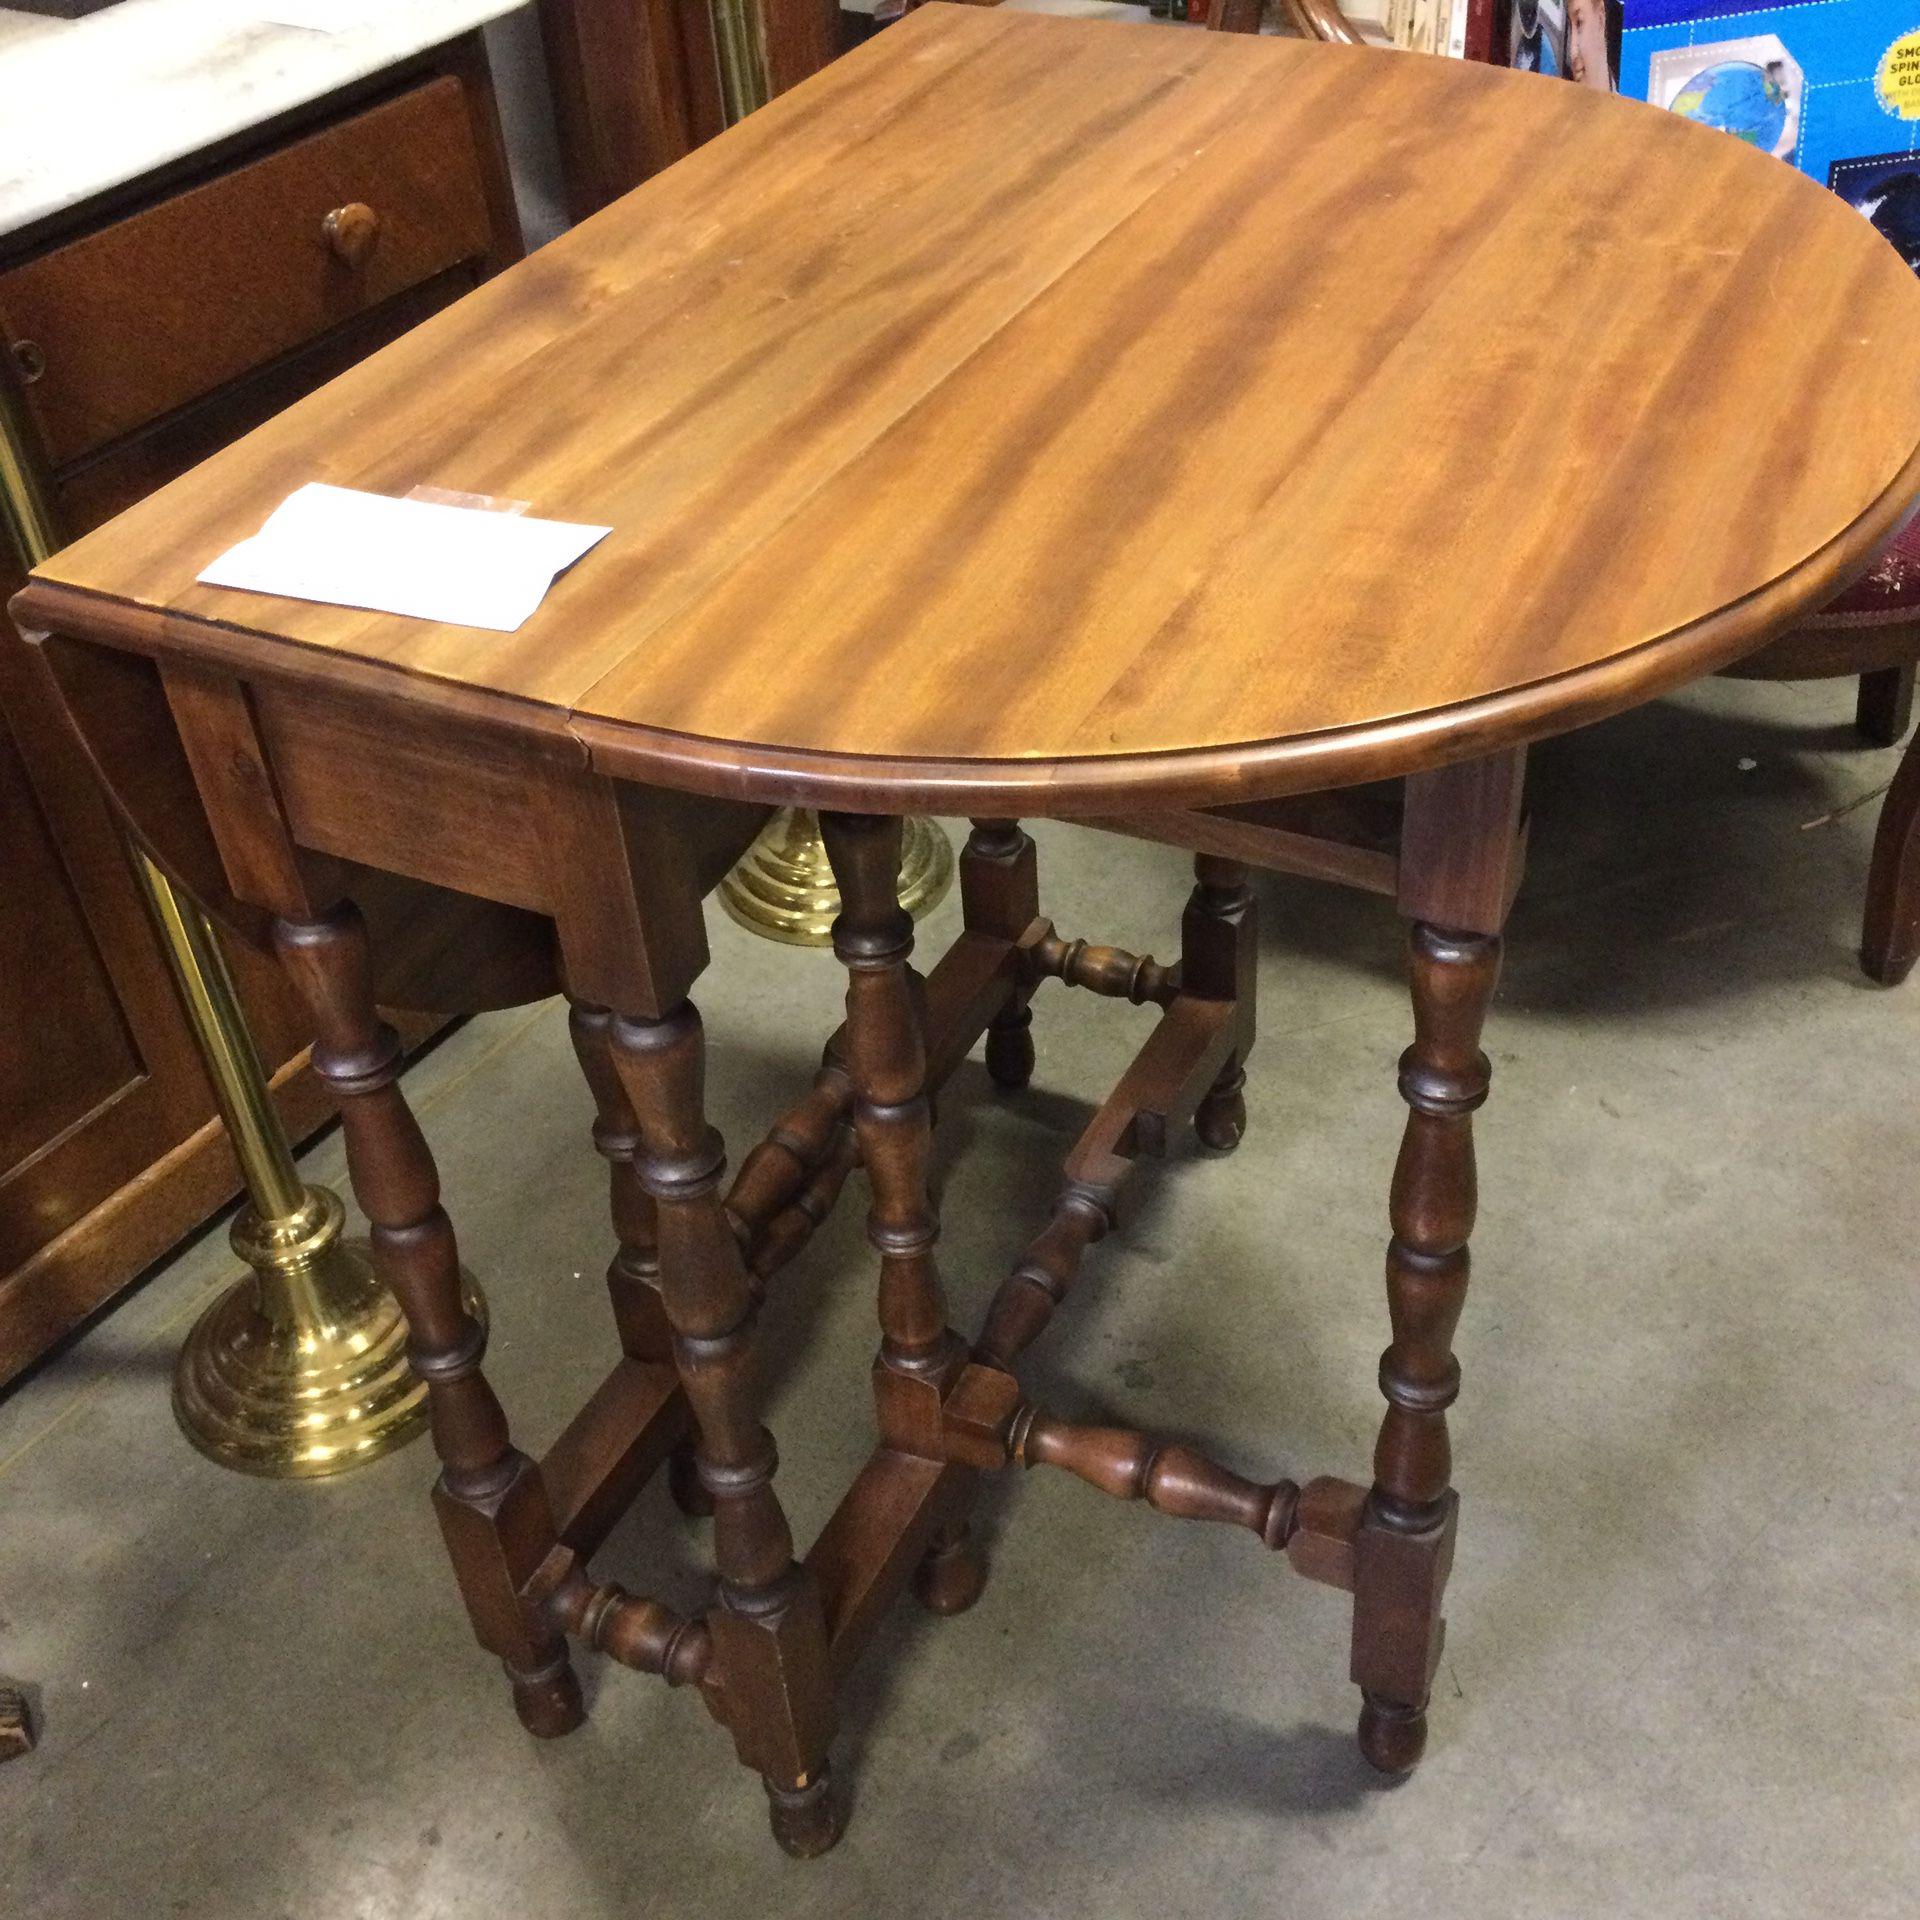 Vintage Dropleaf Table - Versatile!